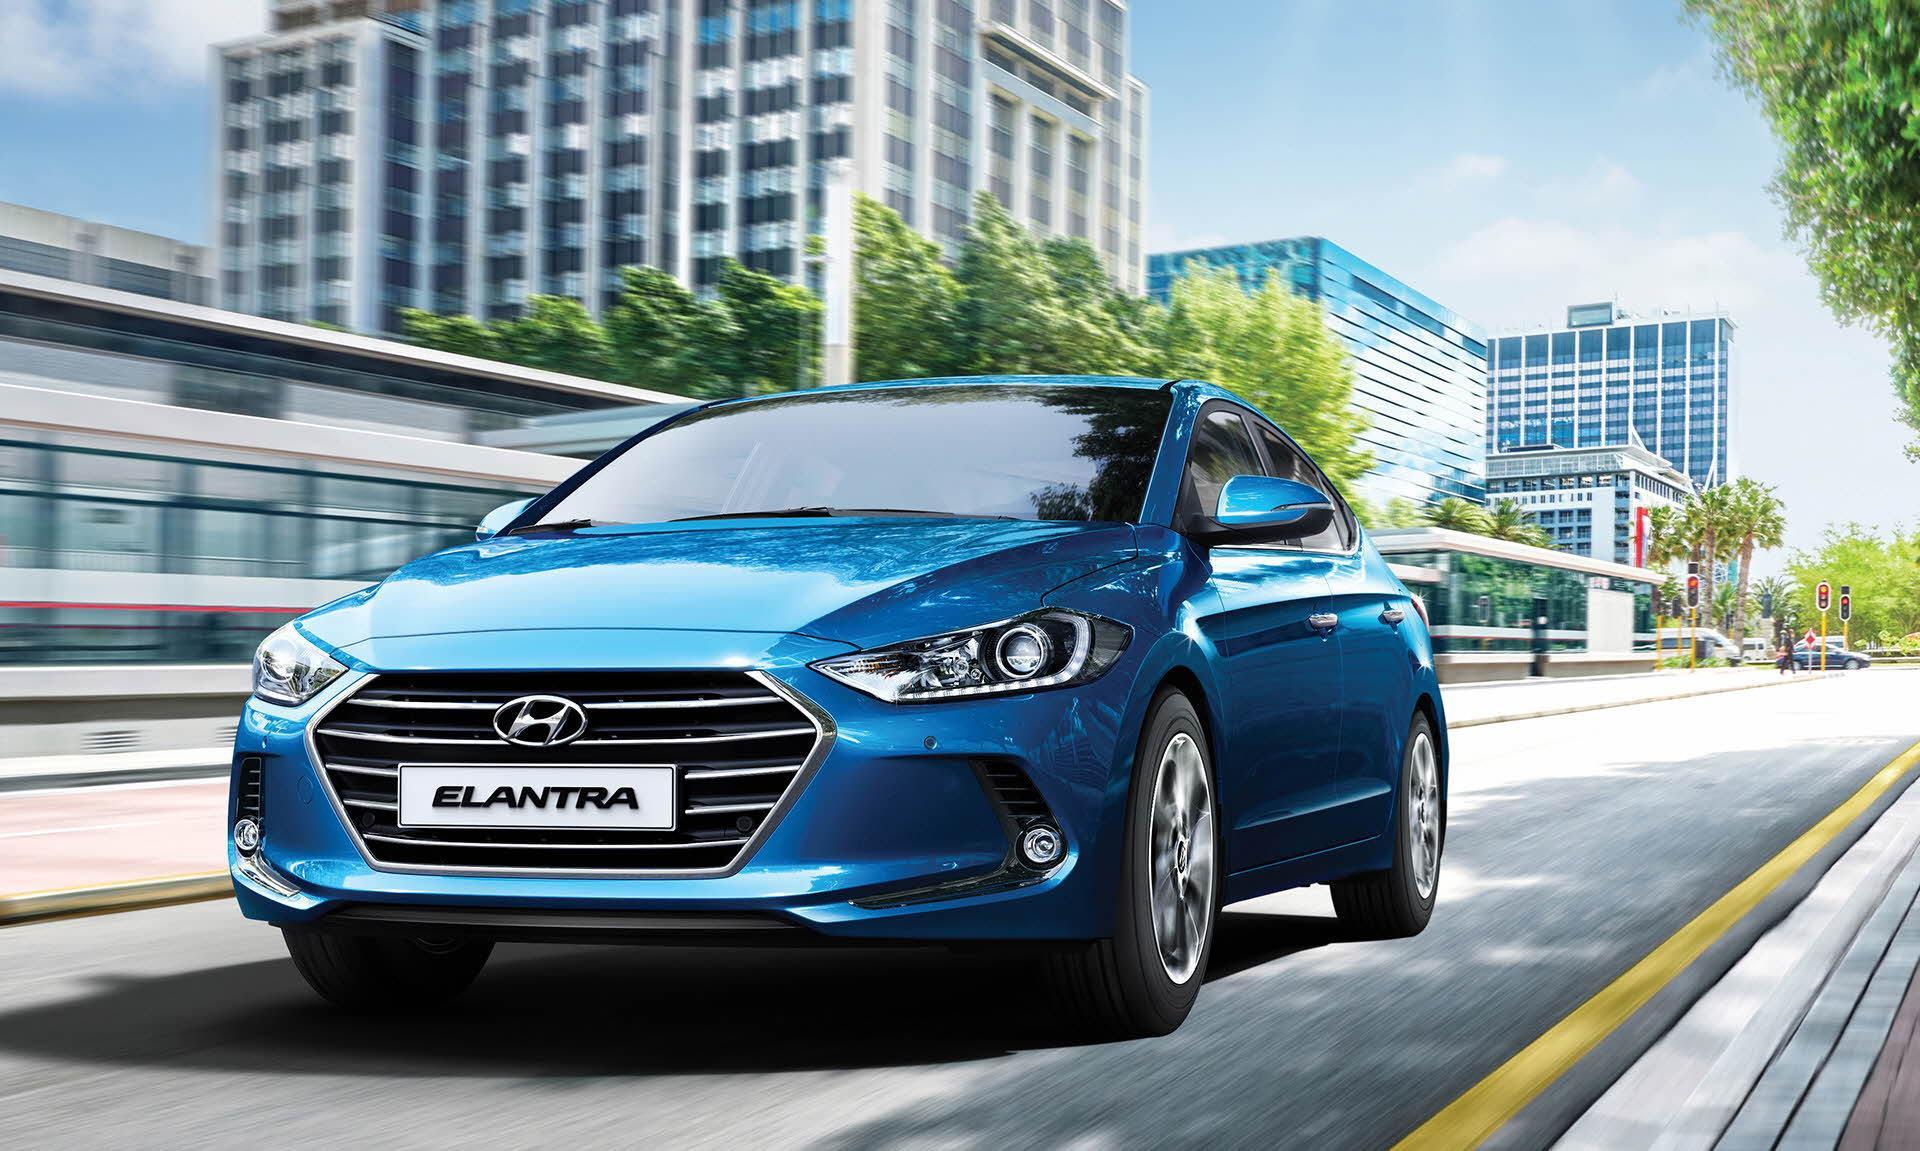 Red 2017 Hyundai Elantra >> All-new 2017 Hyundai Elantra to launch on August 23, 2016